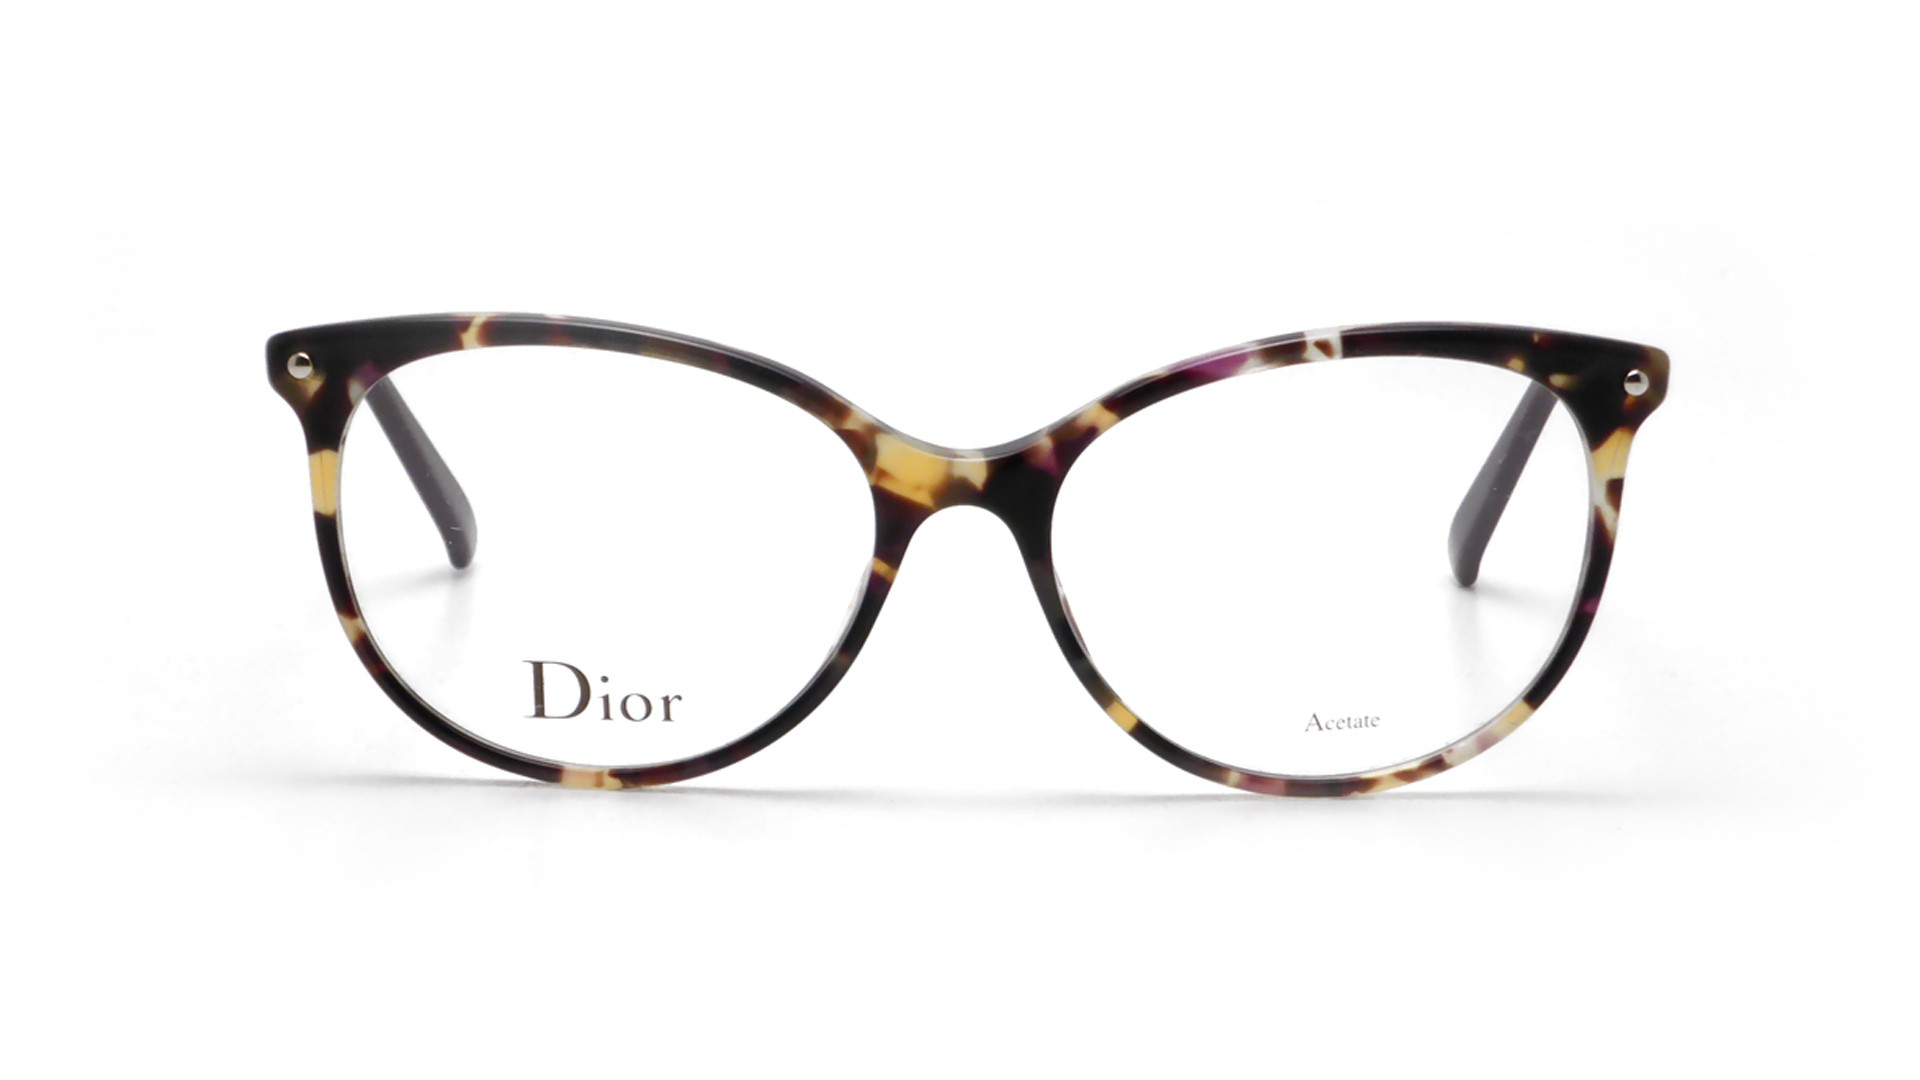 Dior CD3284 LBV 53-16 Multicolore   Prix 161,90 €   Visiofactory 8bc9ccfcf755